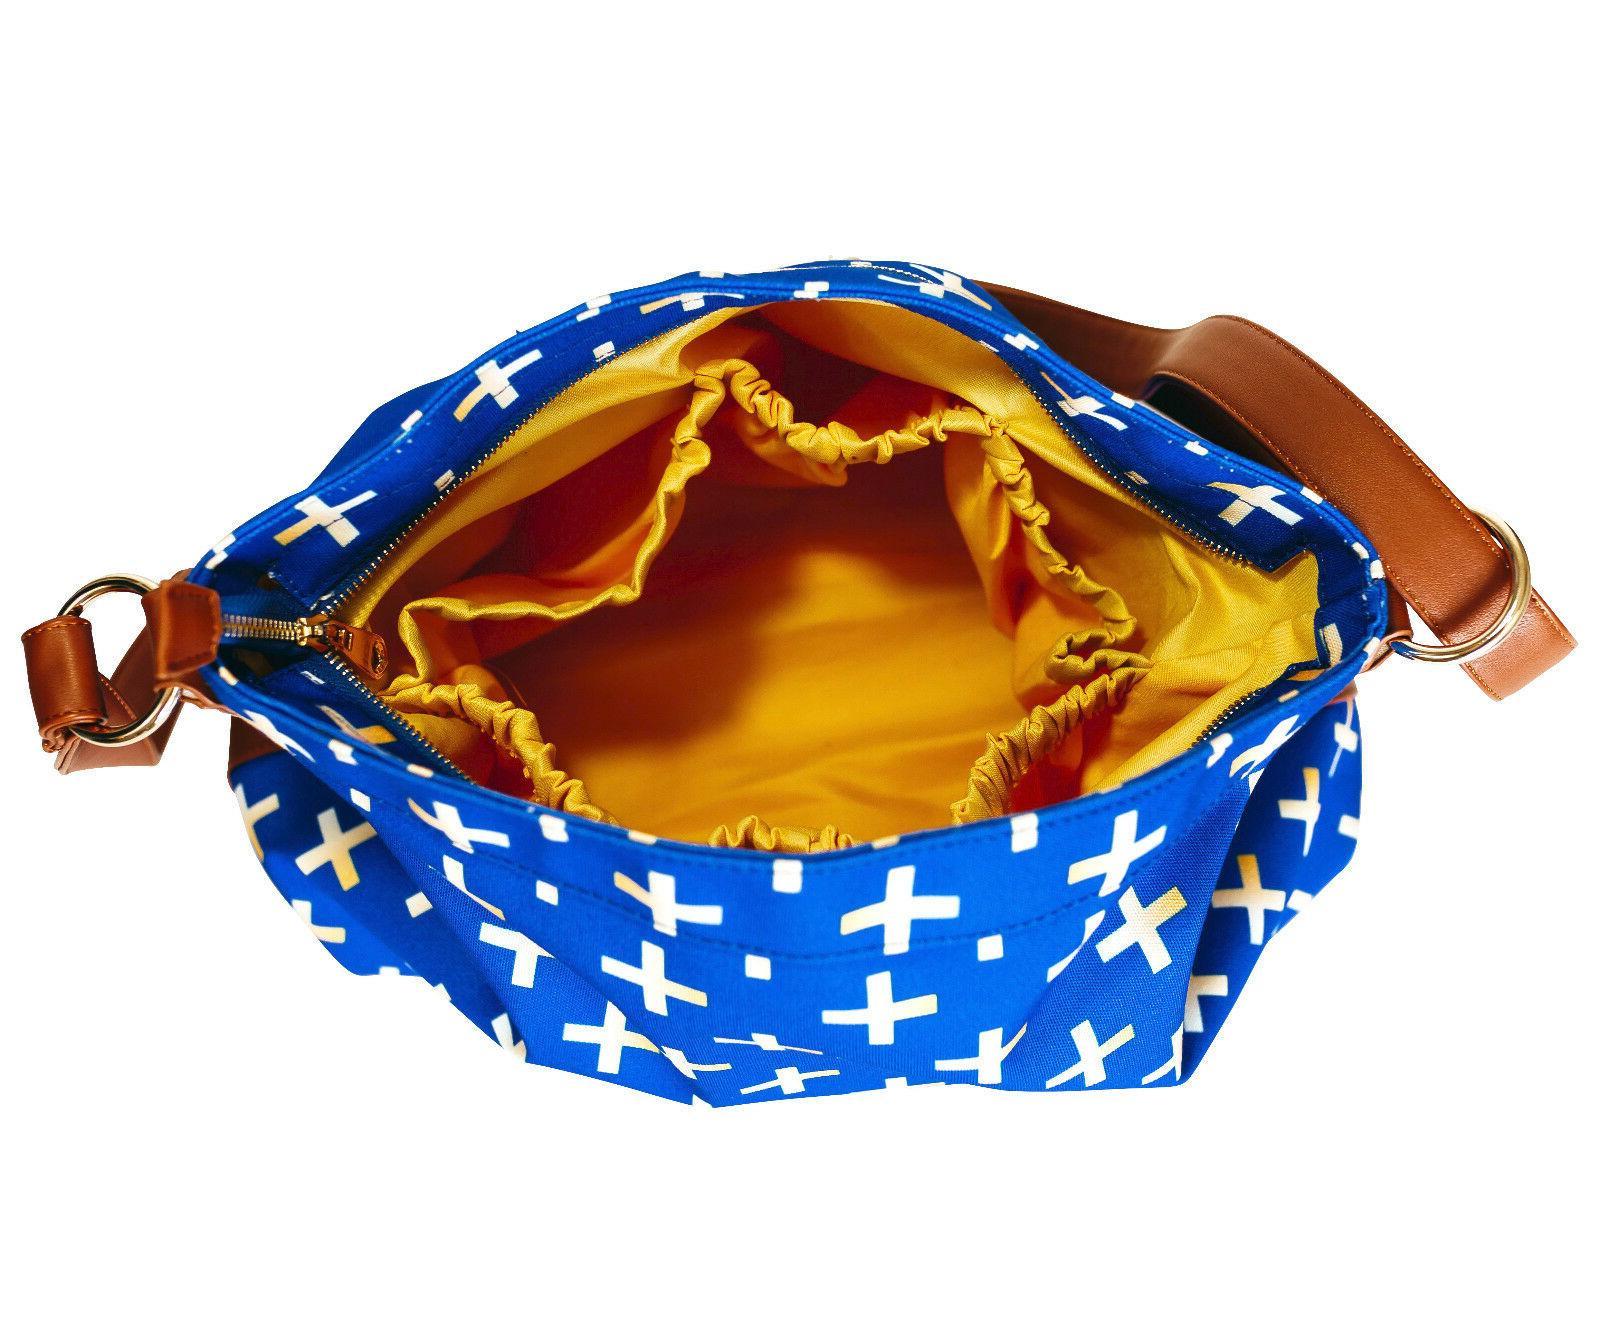 Blue Hobo Set of 10 | Wholesale Bulk Liquidation Sale Overstock